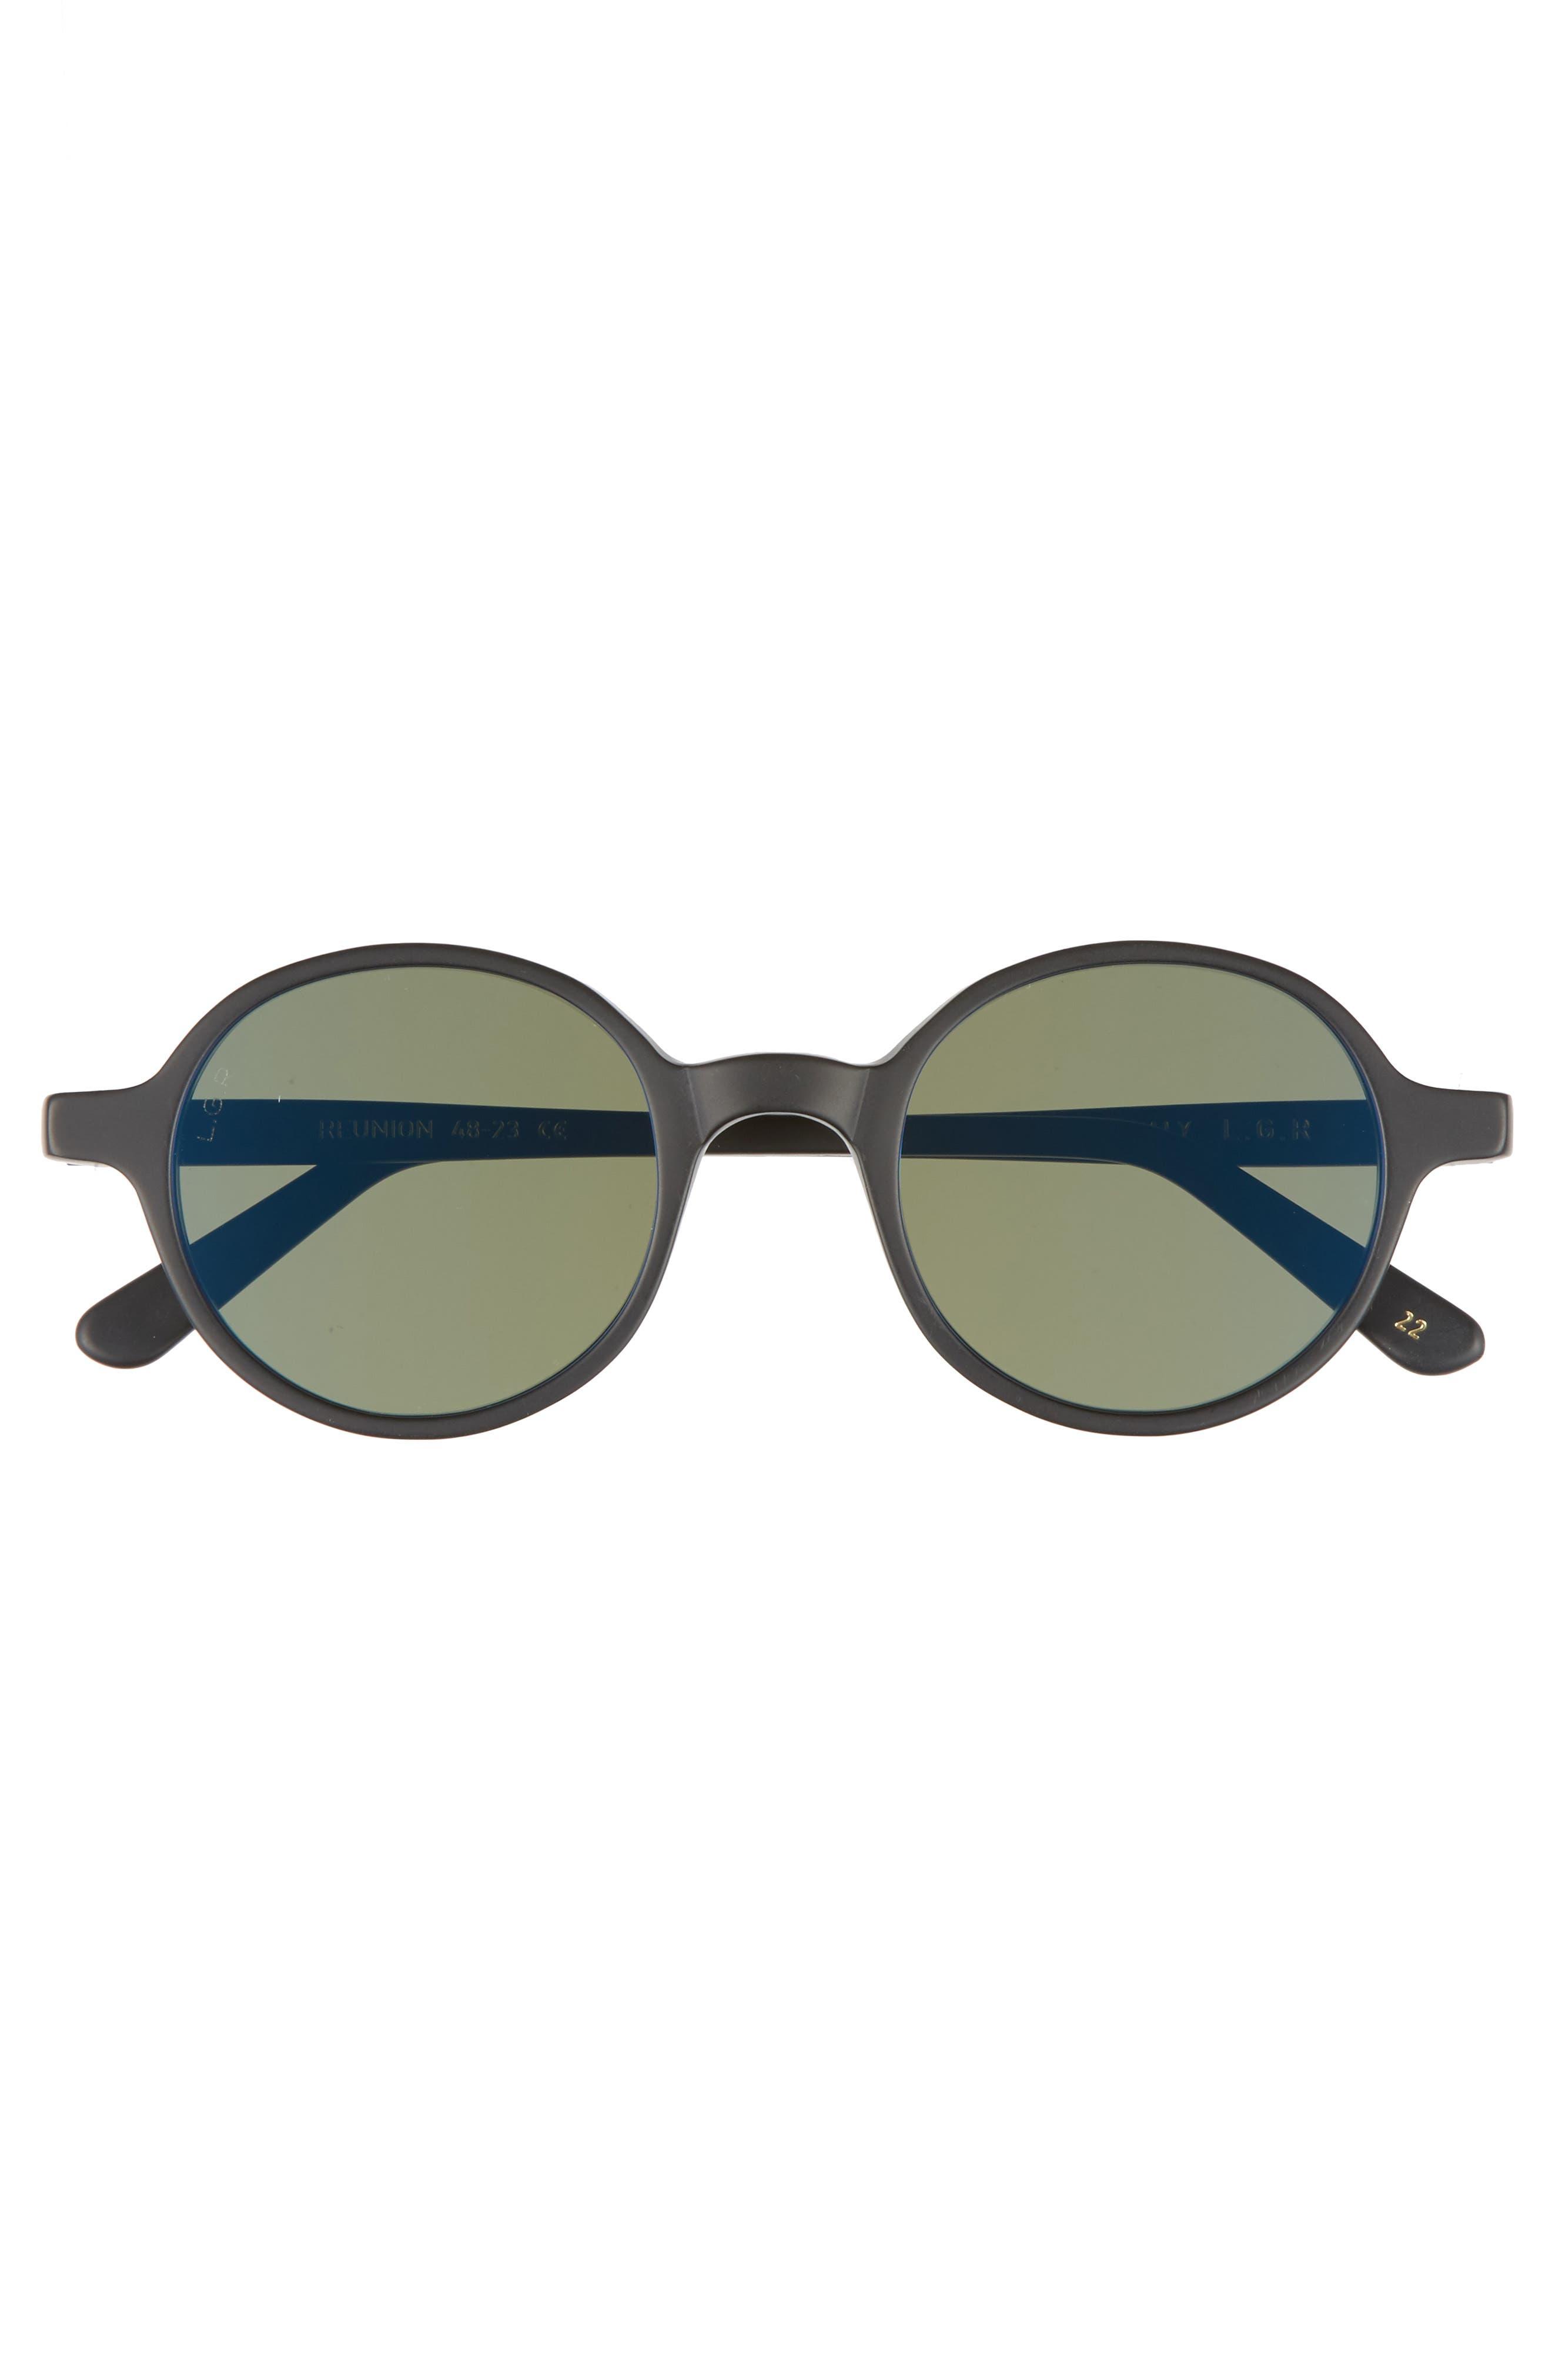 Reunion 48mm Sunglasses,                             Alternate thumbnail 2, color,                             001